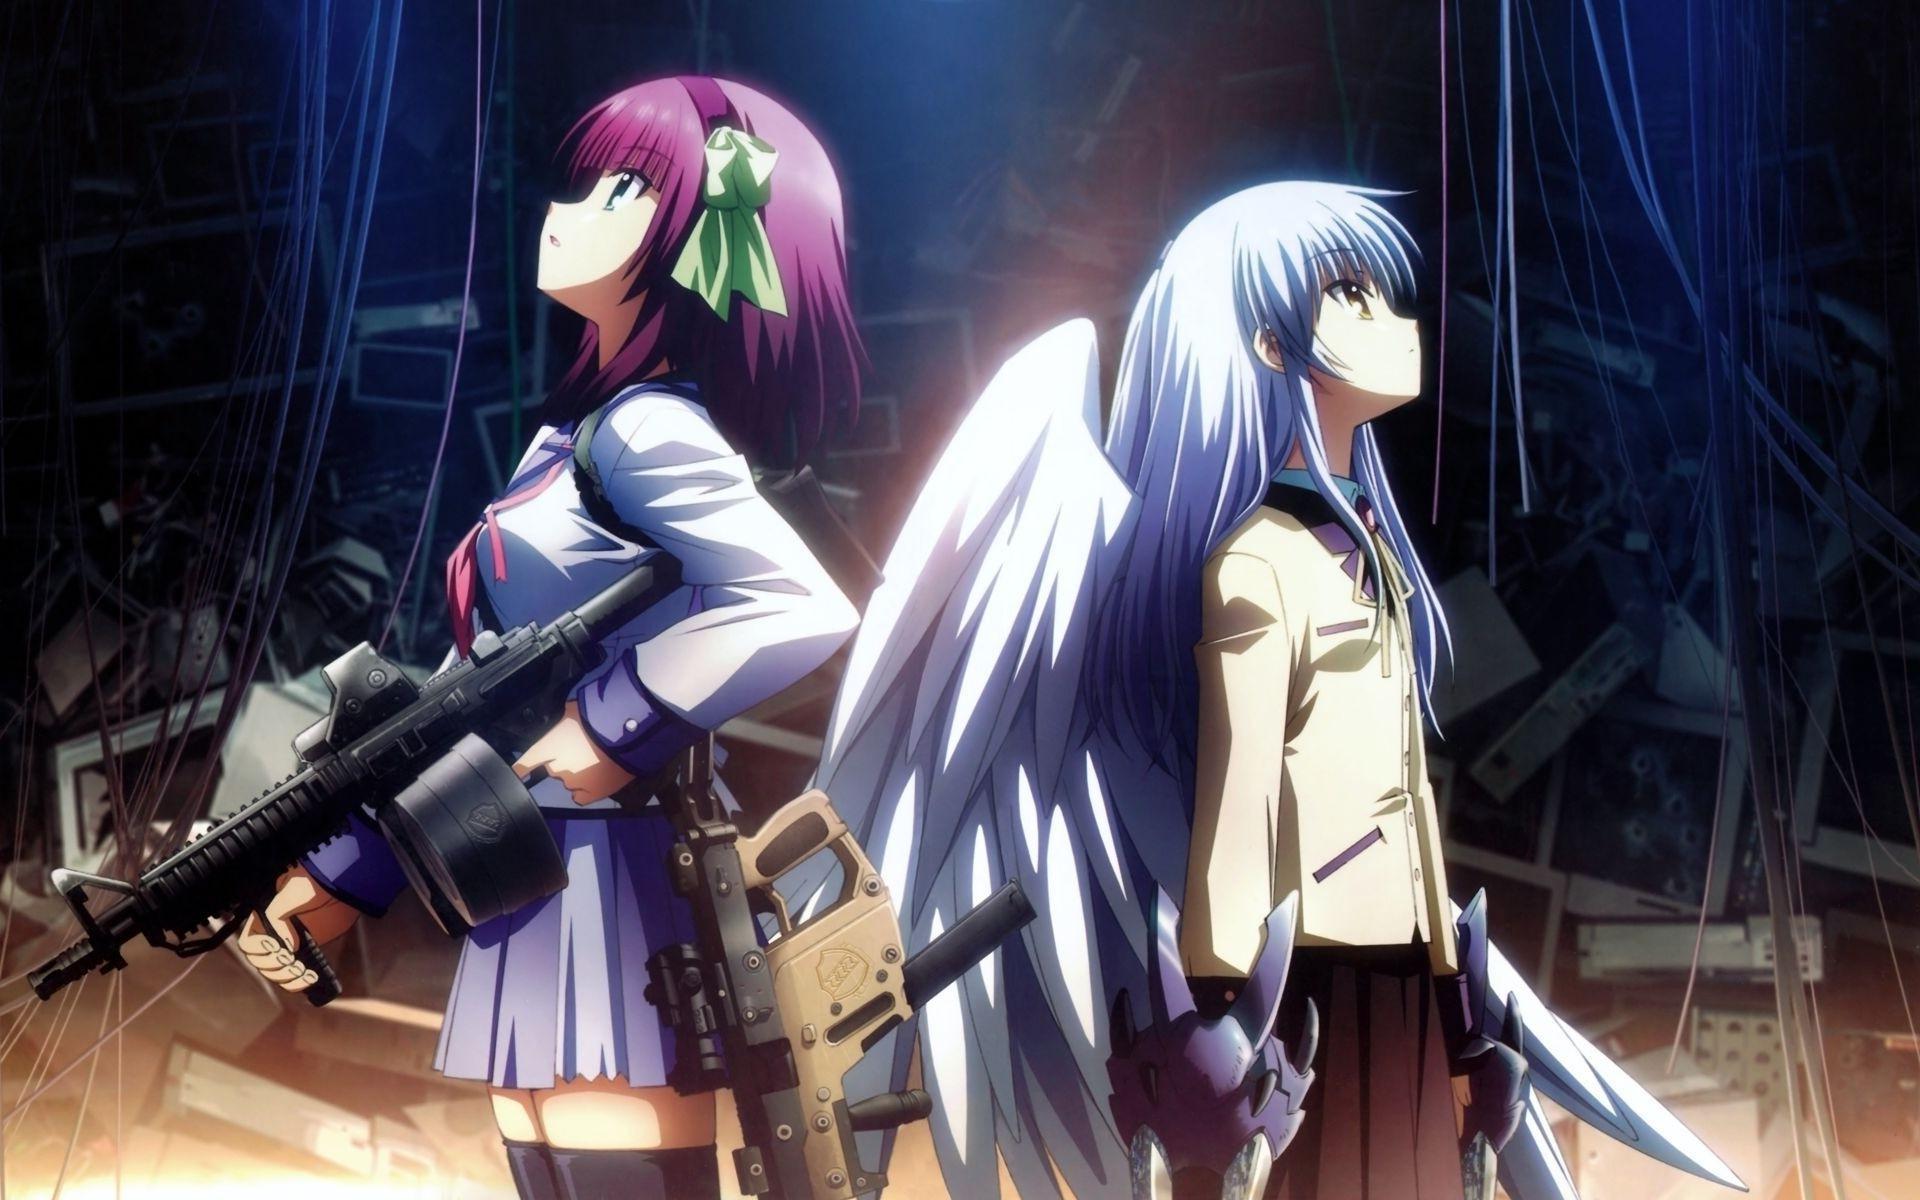 Anime Yuri Wallpaper 74 Pictures